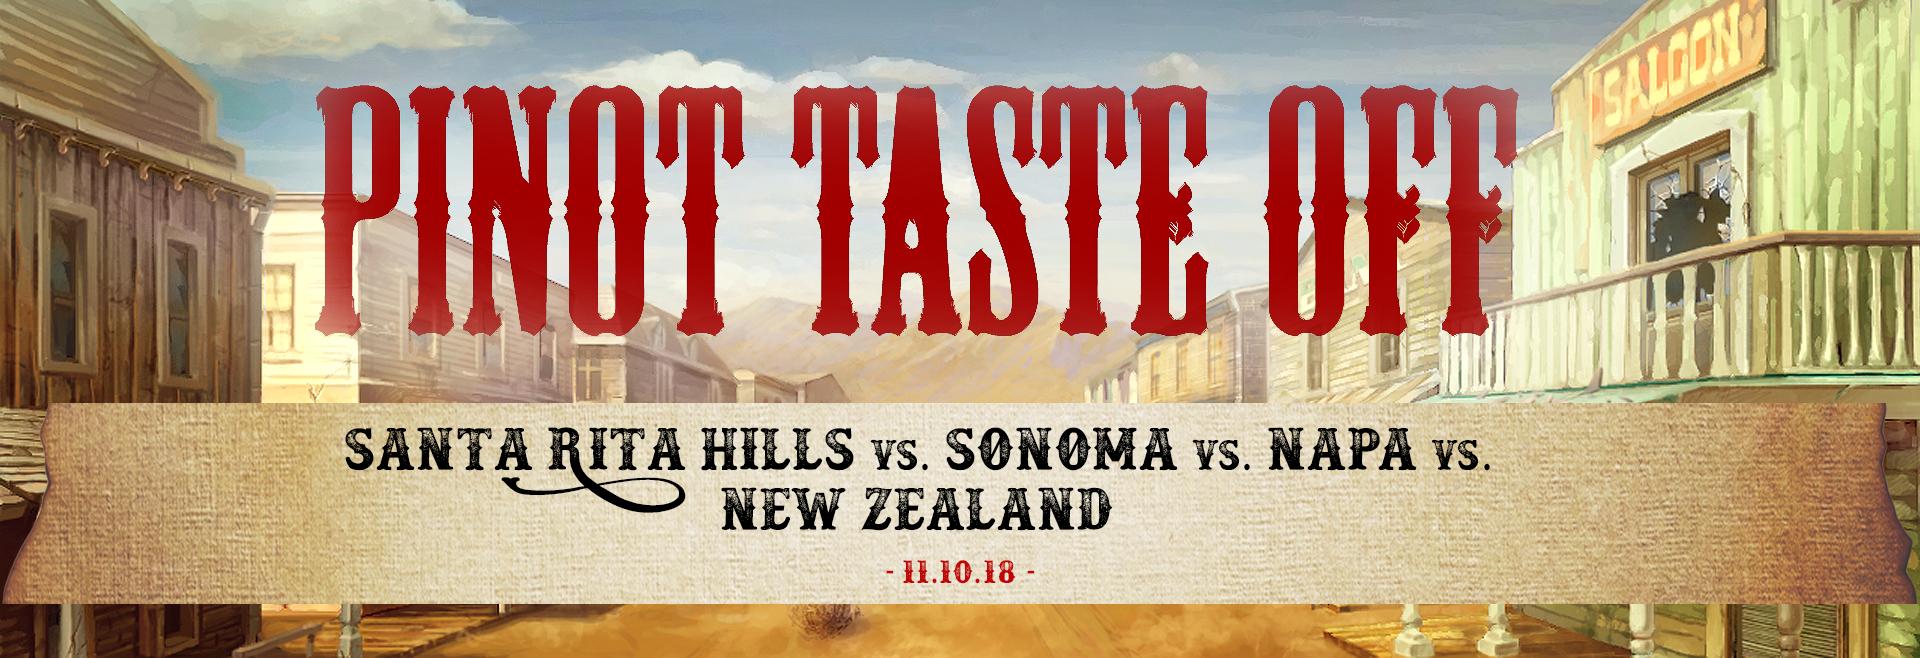 pinot taste off_wineLA banner.jpg